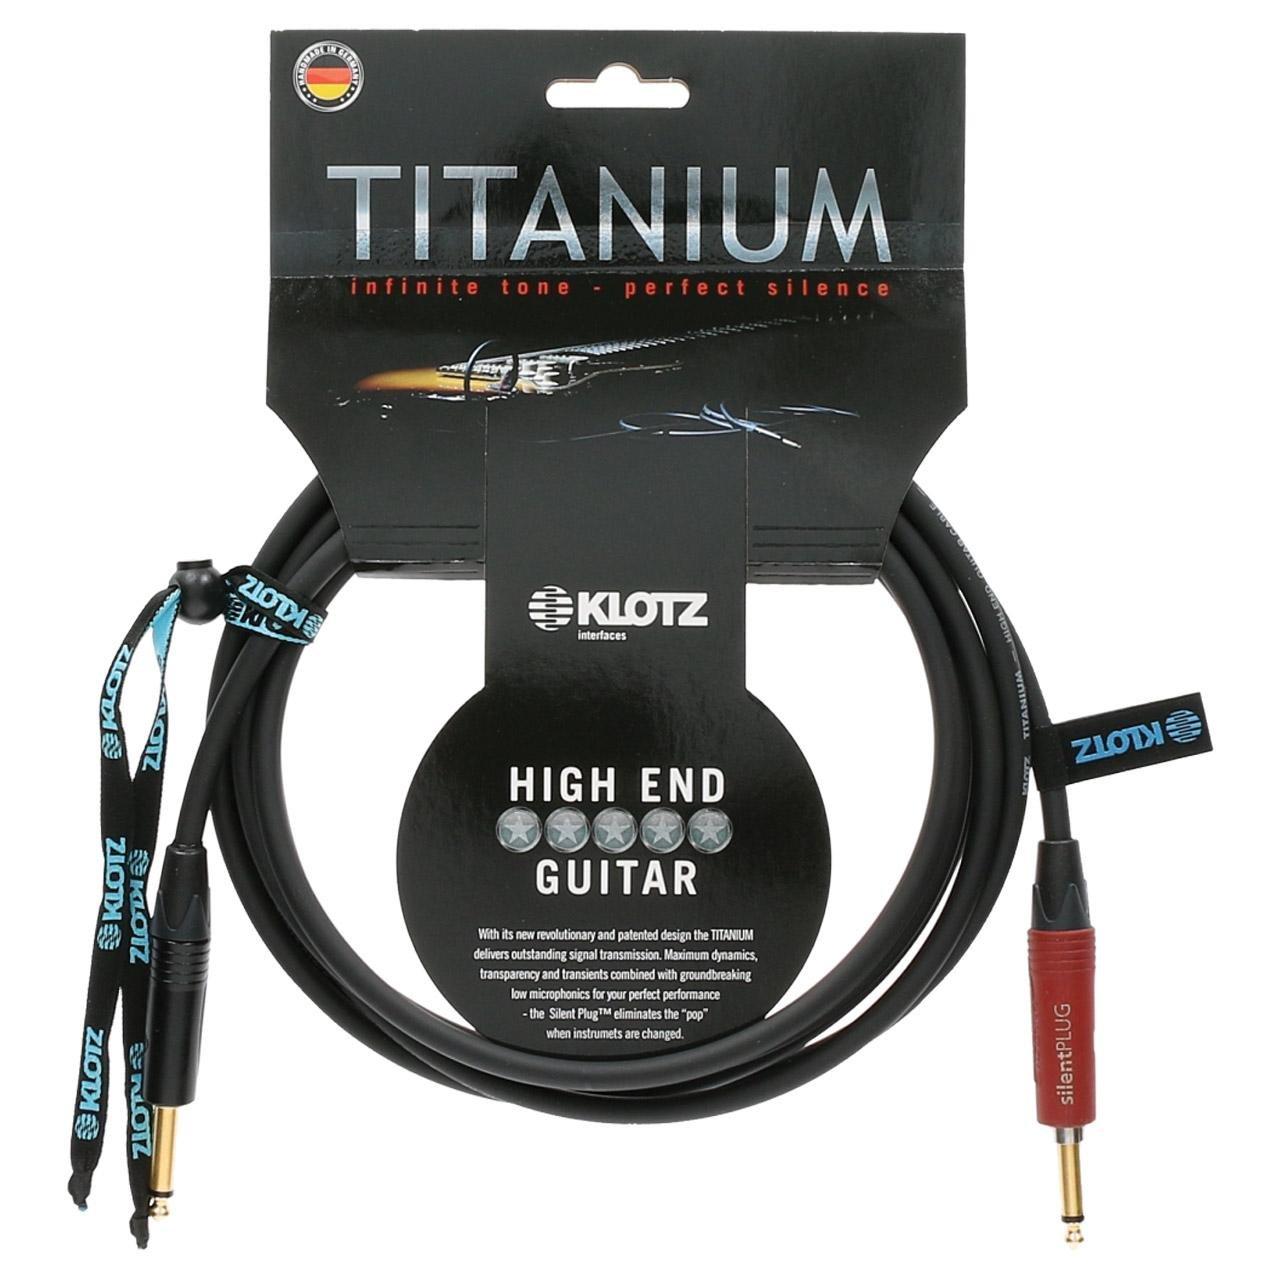 KLOTZ Titanium 15 Foot Instrument Cable (KLO-TI-0450PSP)